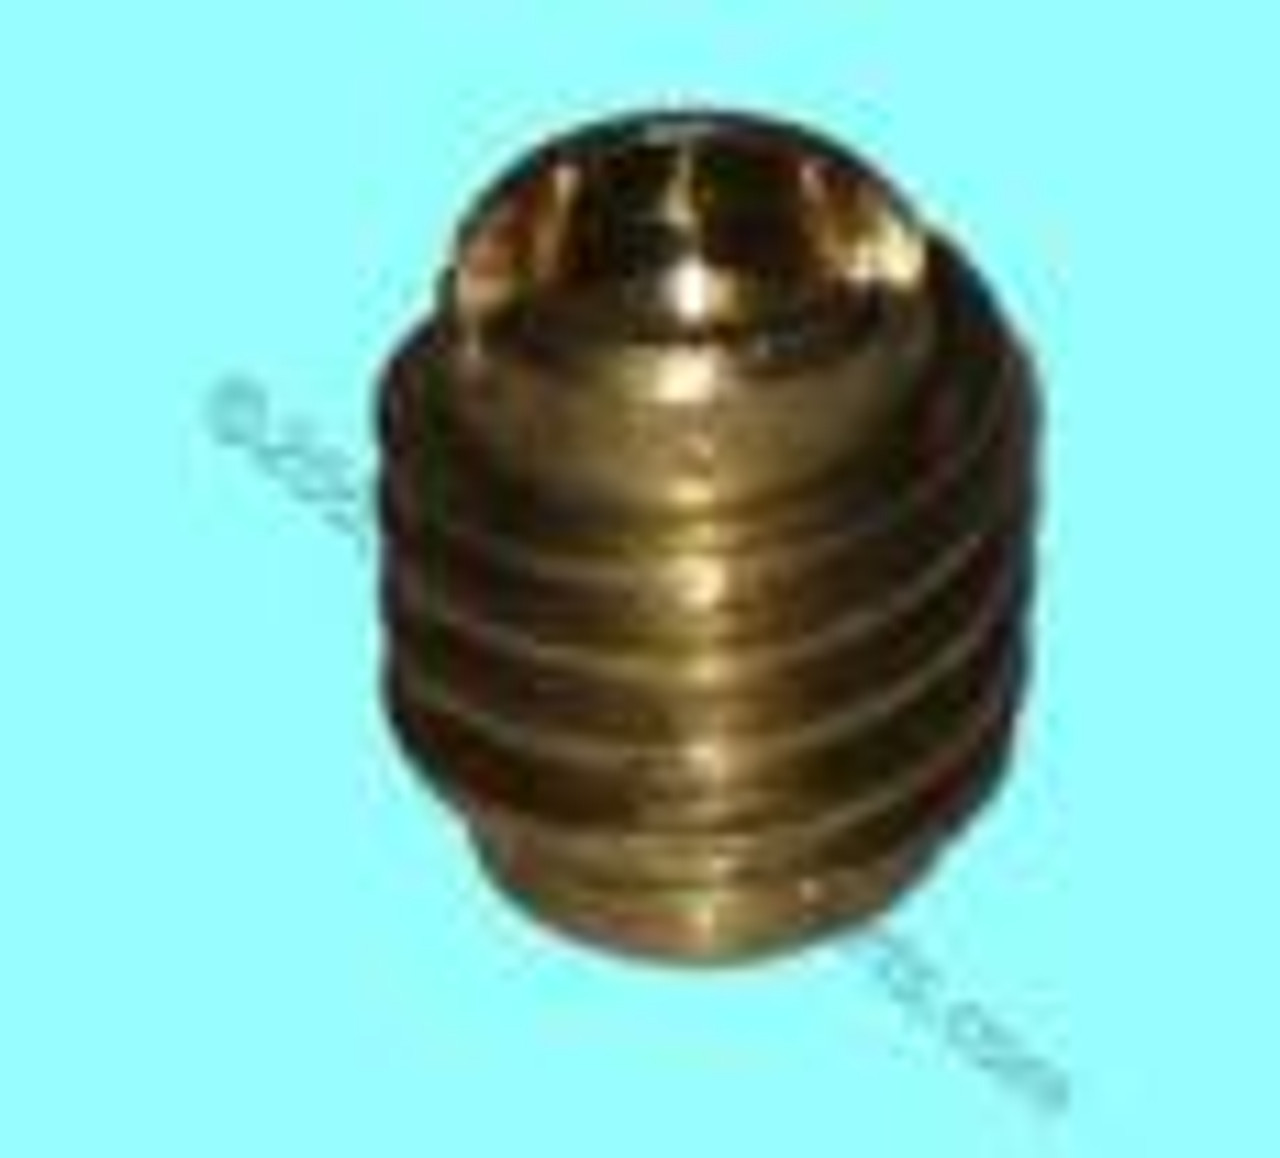 10-24 Brass Threaded Insert